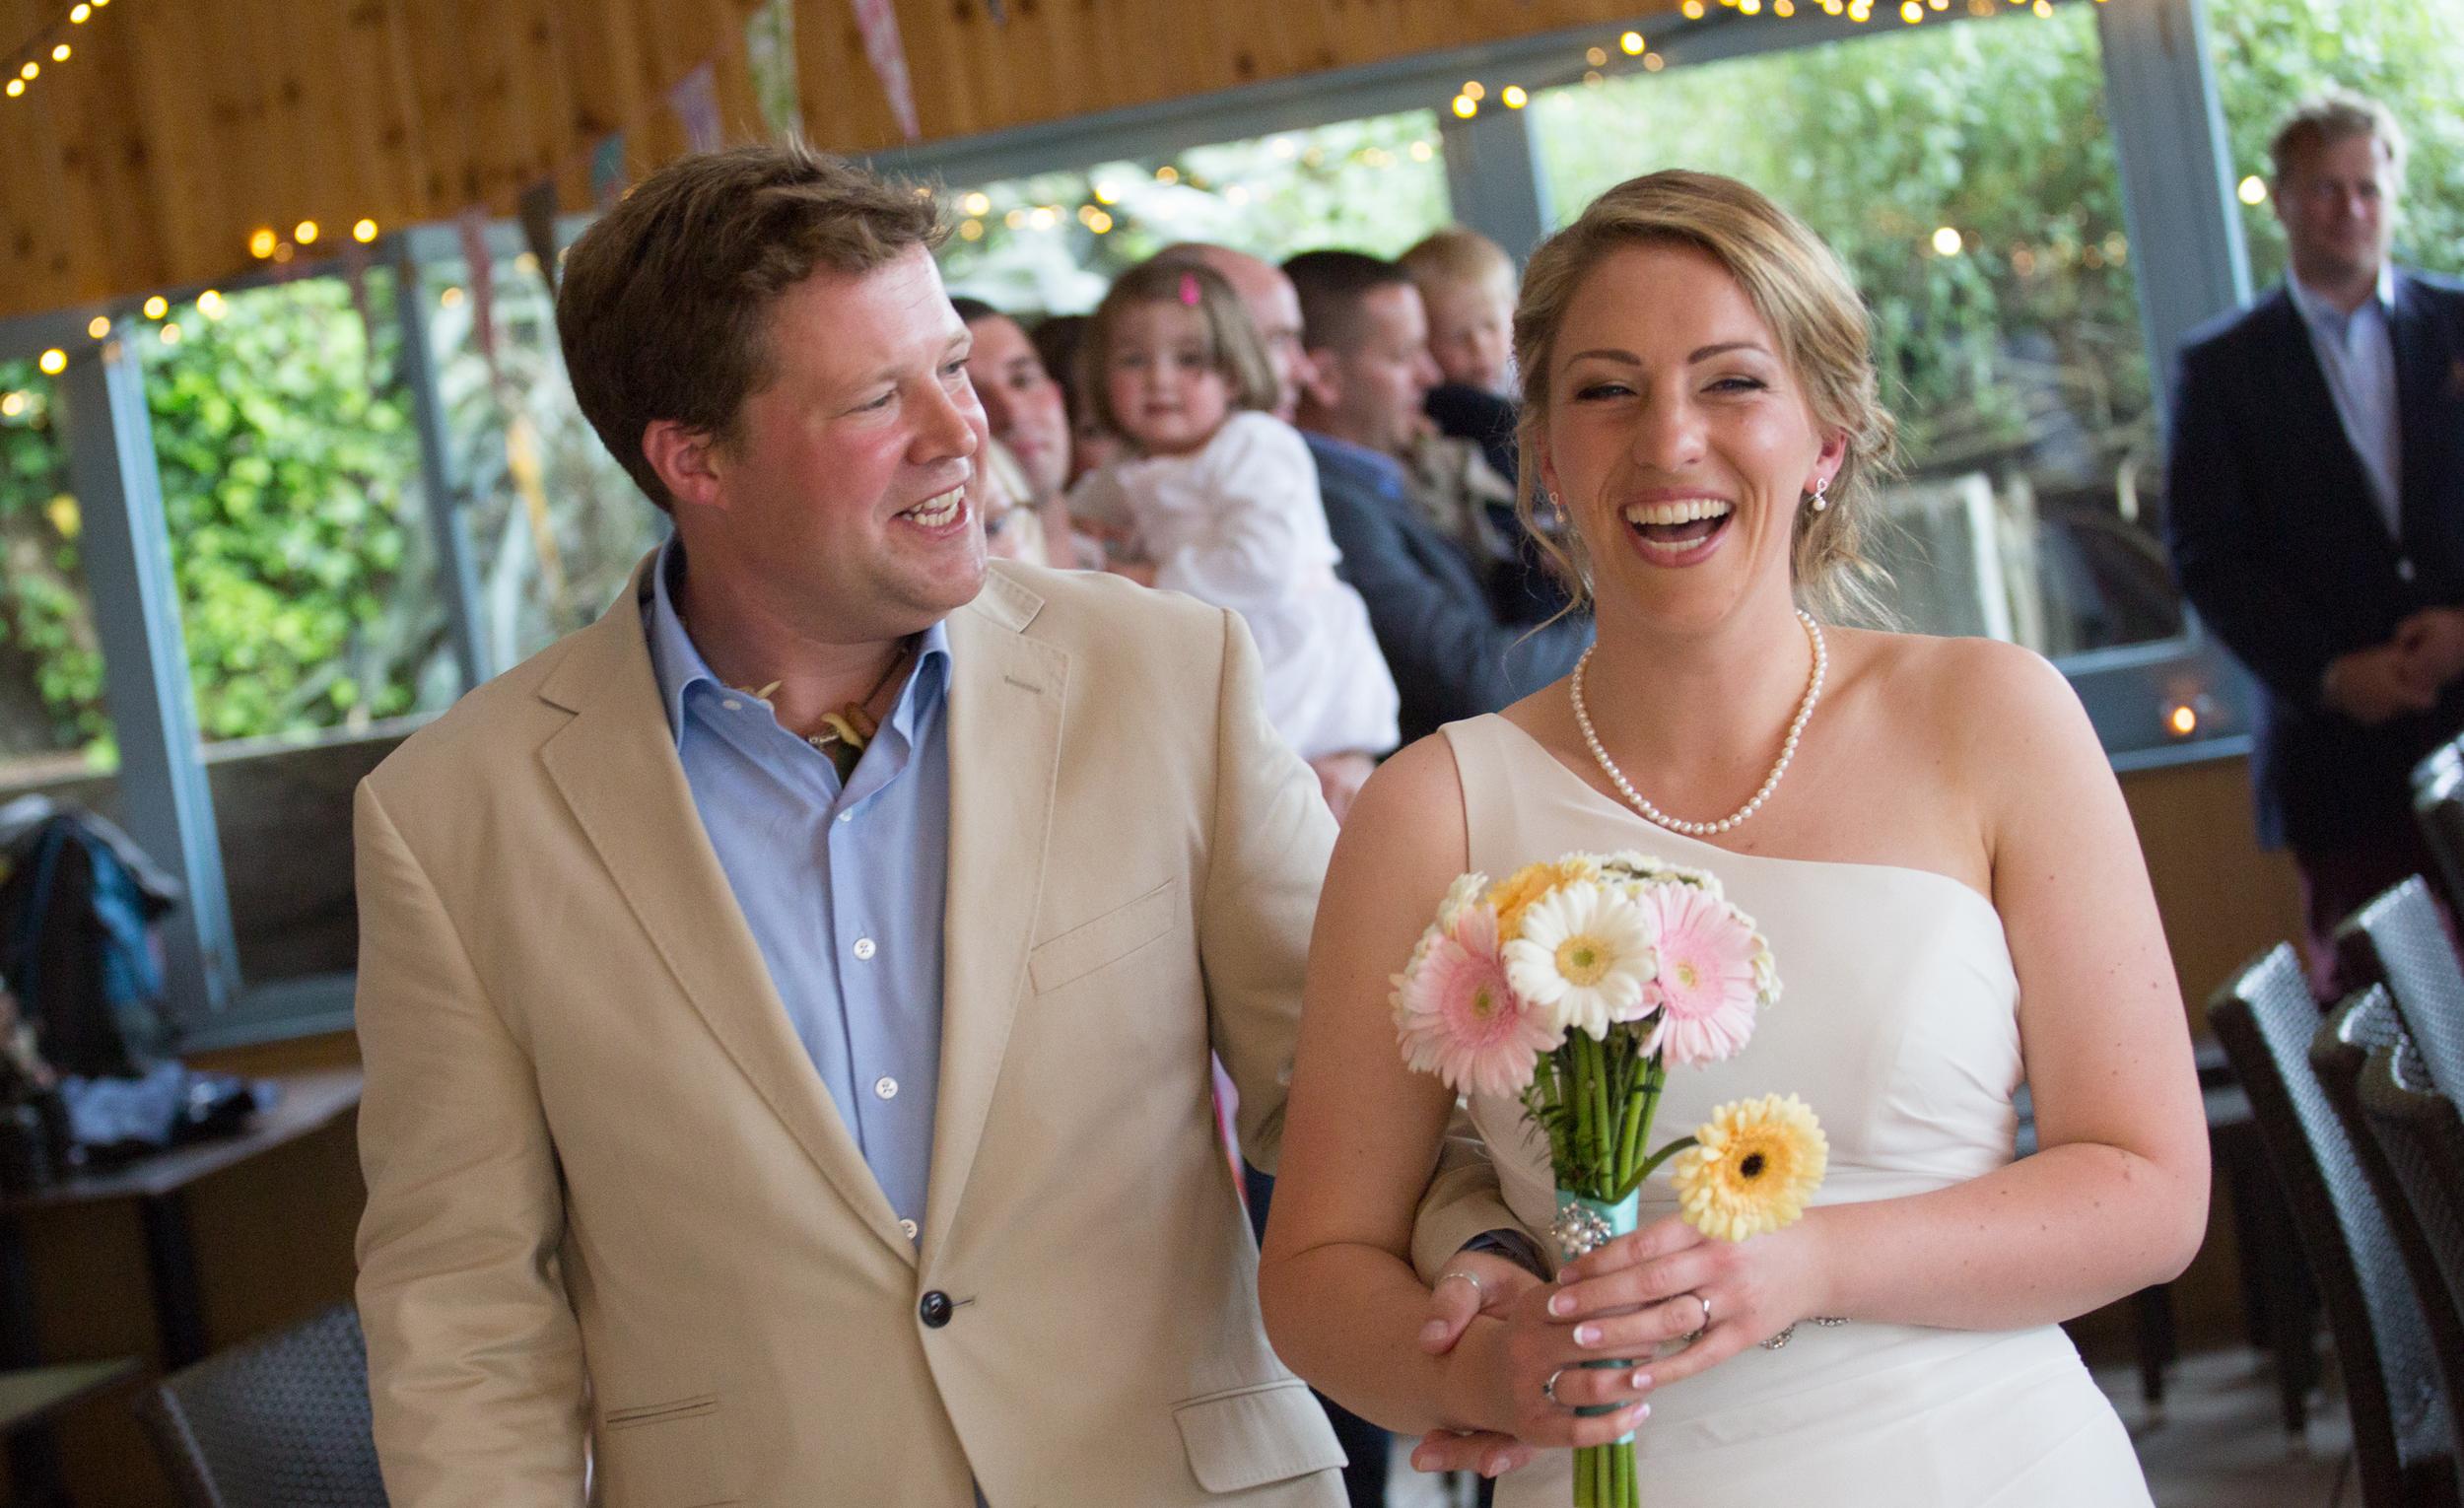 dartmouth-wedding-flowers-london-uk-destination-wedding-photography-Adam-Rowley